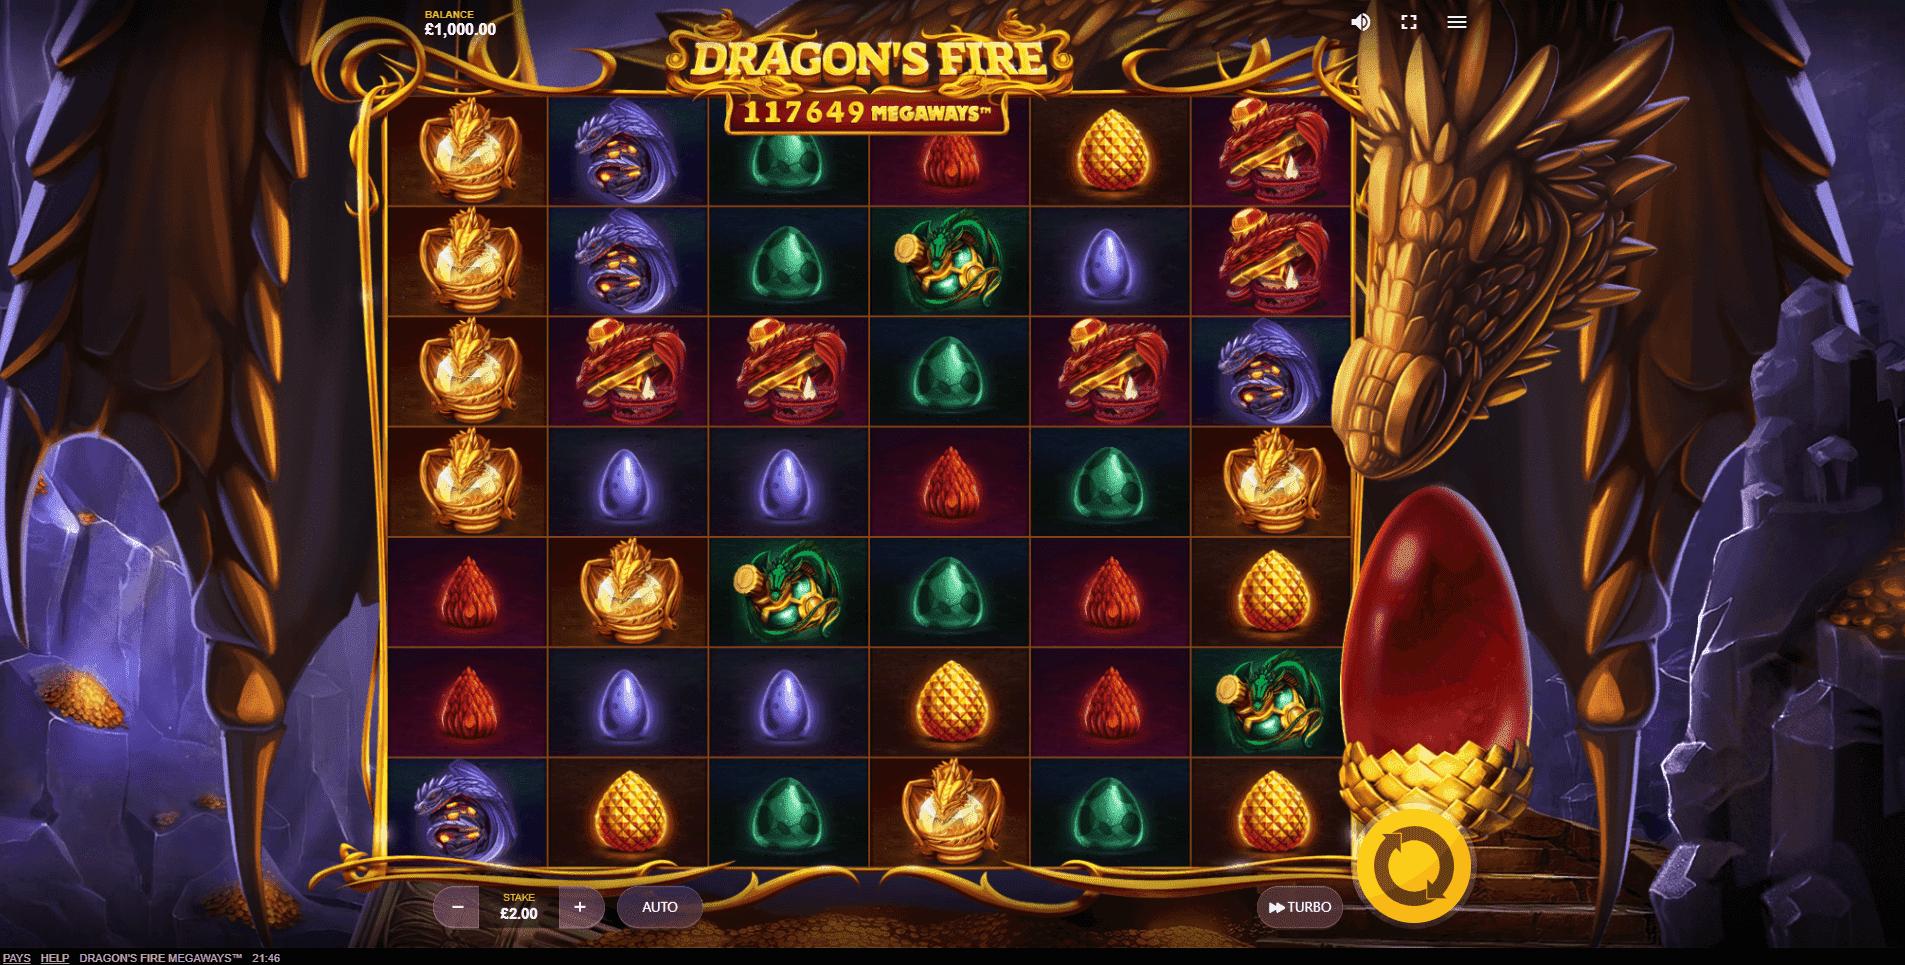 Dragons Fire Megaways slot machine screenshot